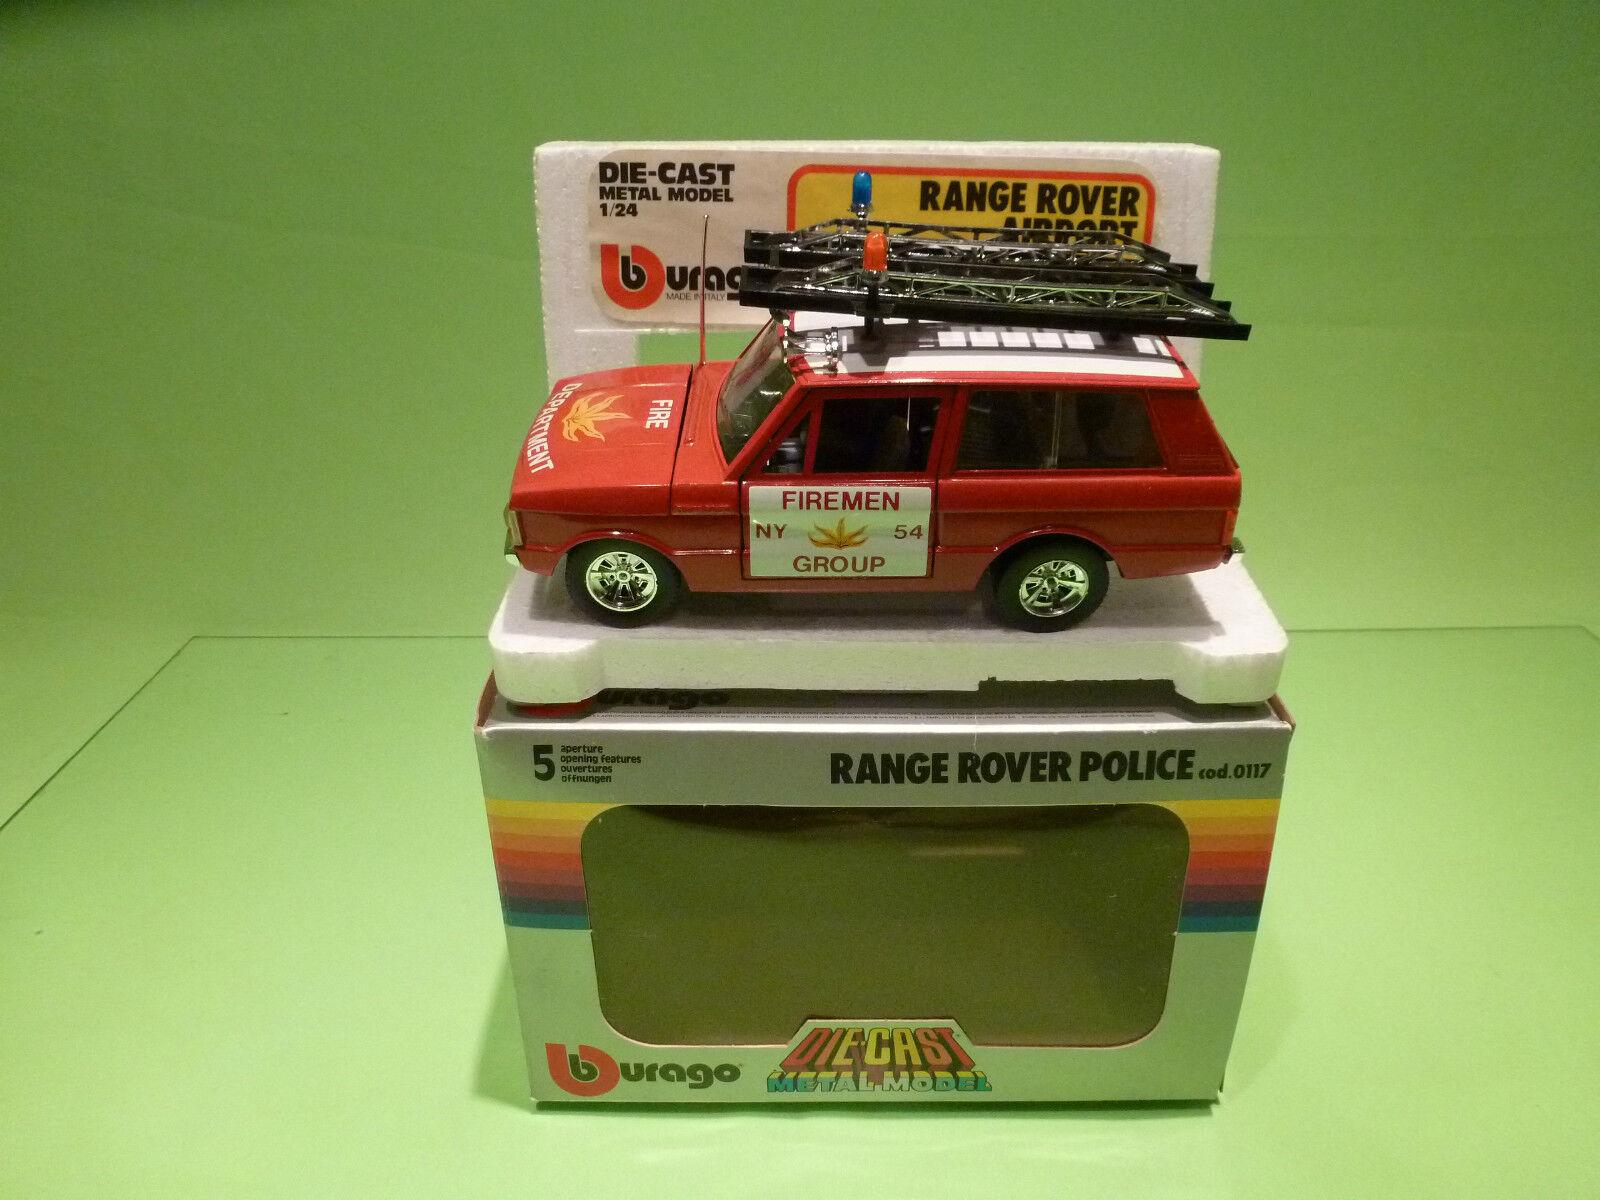 BBURAGO 0125 RANGE ROVER - AIRPORT  FIREMEN GROUP - 1 24 VERY GOOD COND. IN BOX